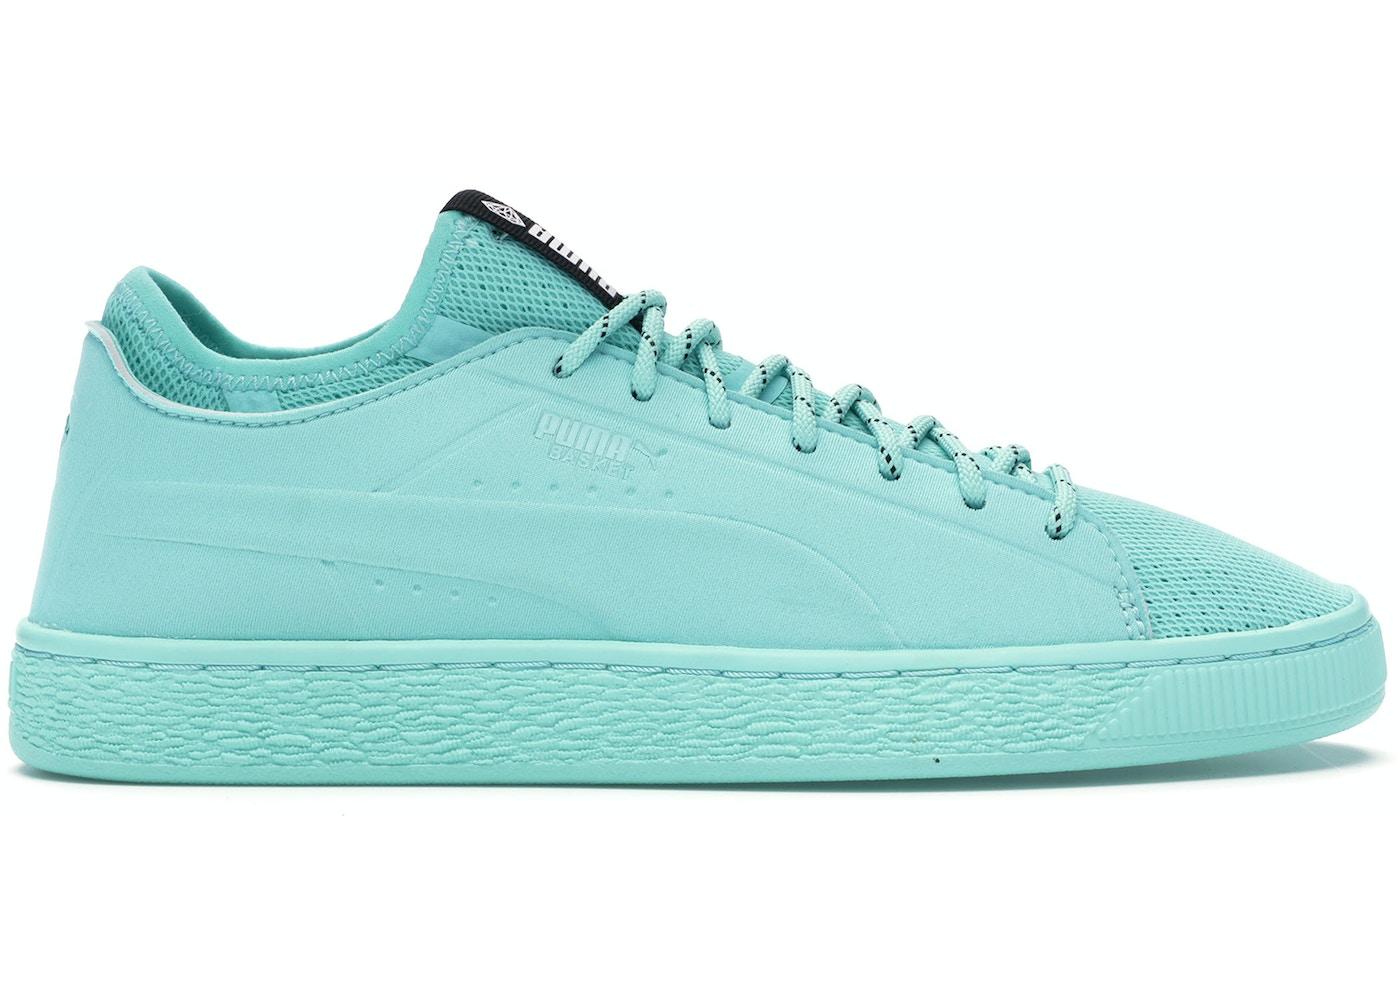 competitive price 007e4 6dbcb Puma Basket Sock Lo Diamond Supply Co Blue